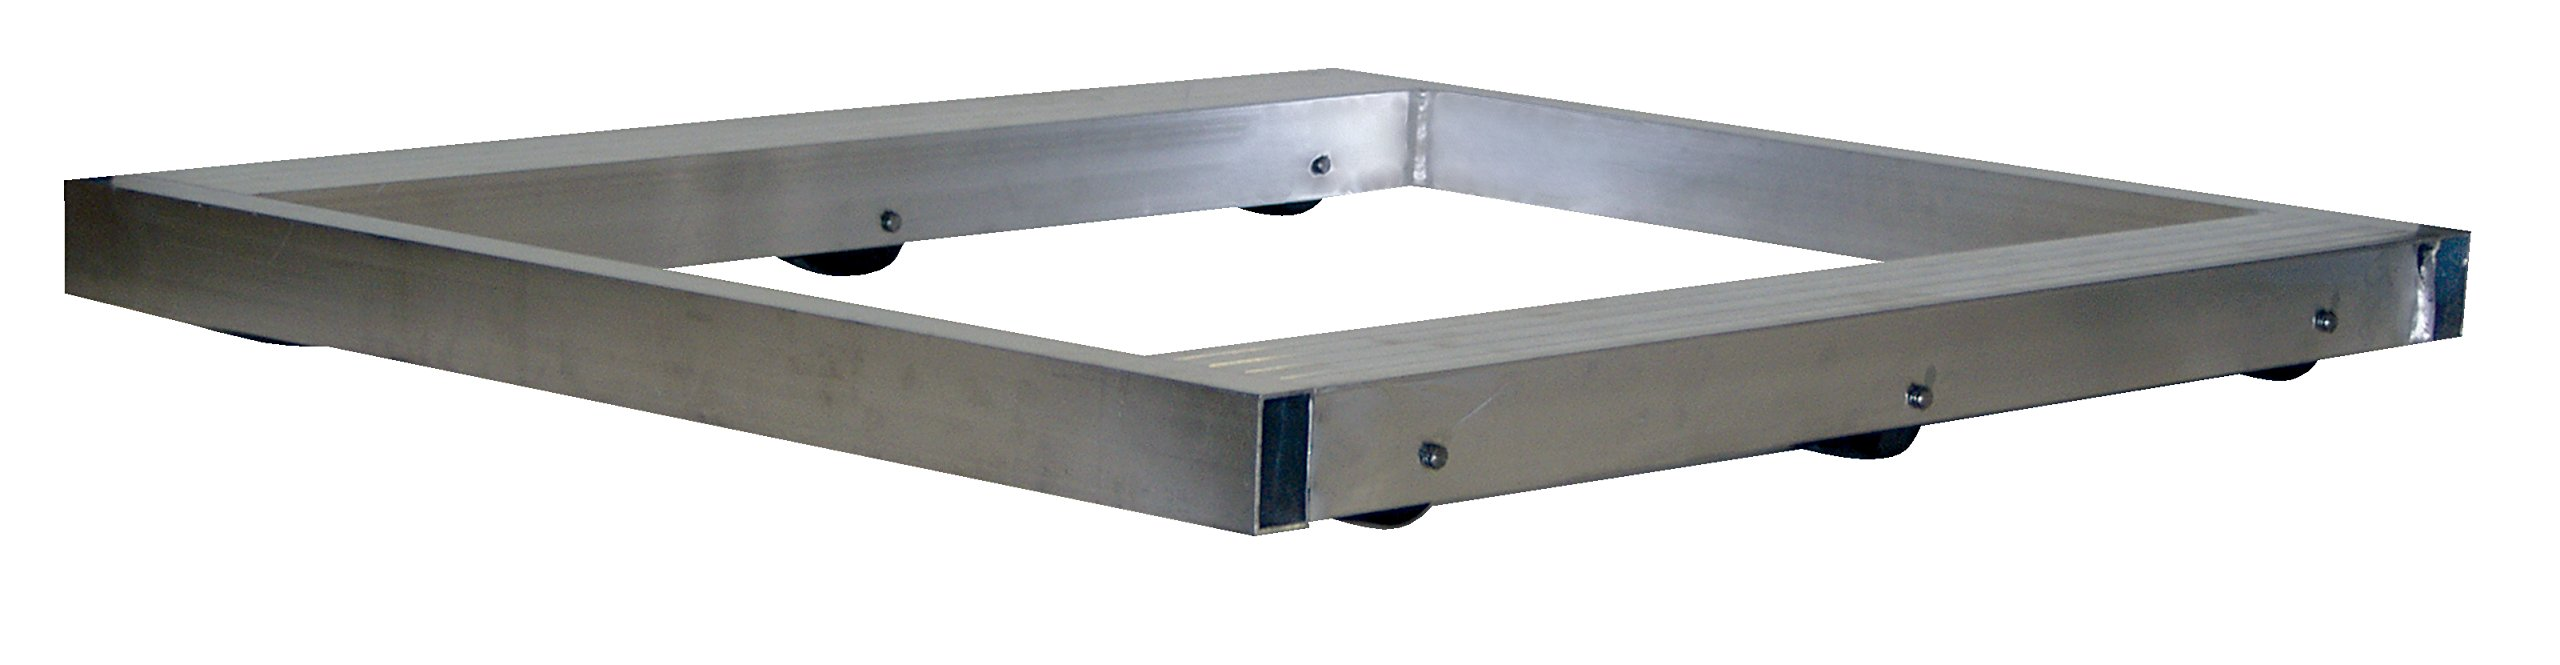 Vestil DOL-3642-10T Pallet Dolly, Tilting, Aluminum, 8,000 lb. Capacity, 4-1/8 x 36 x 42''